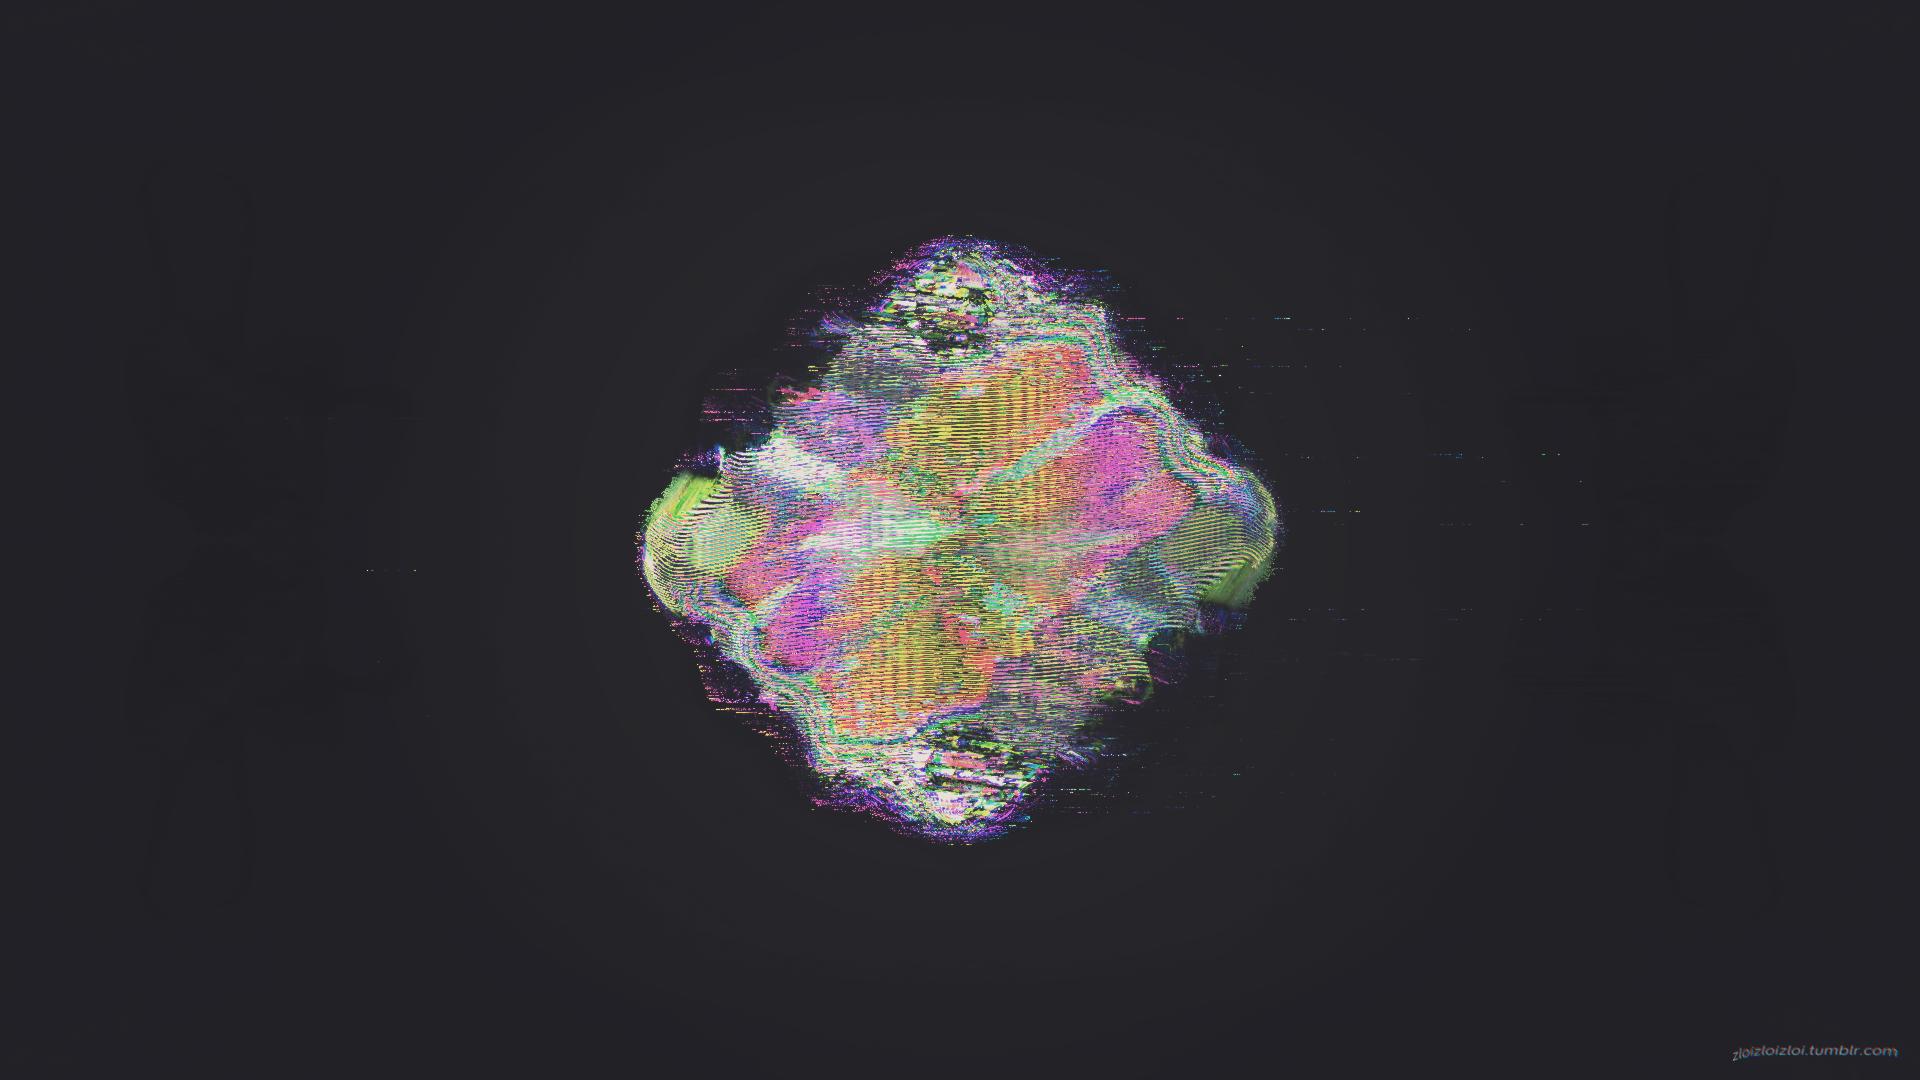 General 1920x1080 glitch art abstract black LSD